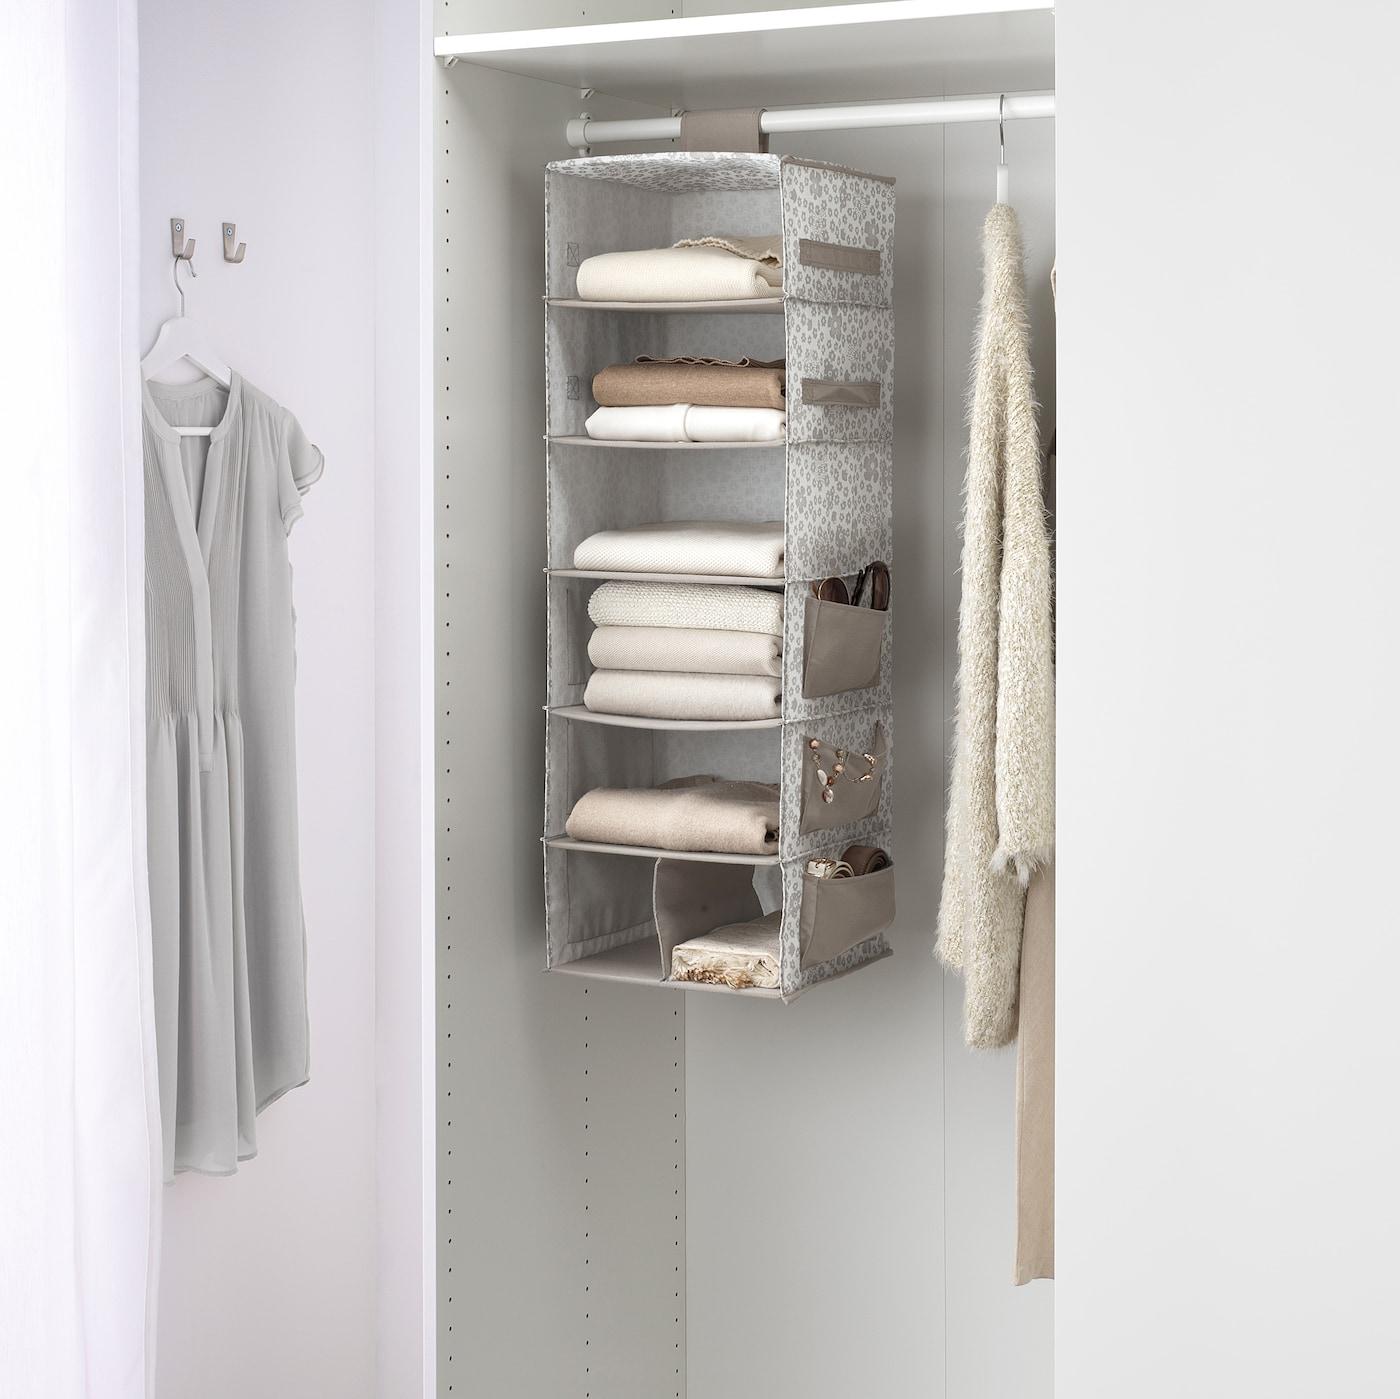 STORSTABBE beige, Hanging storage with